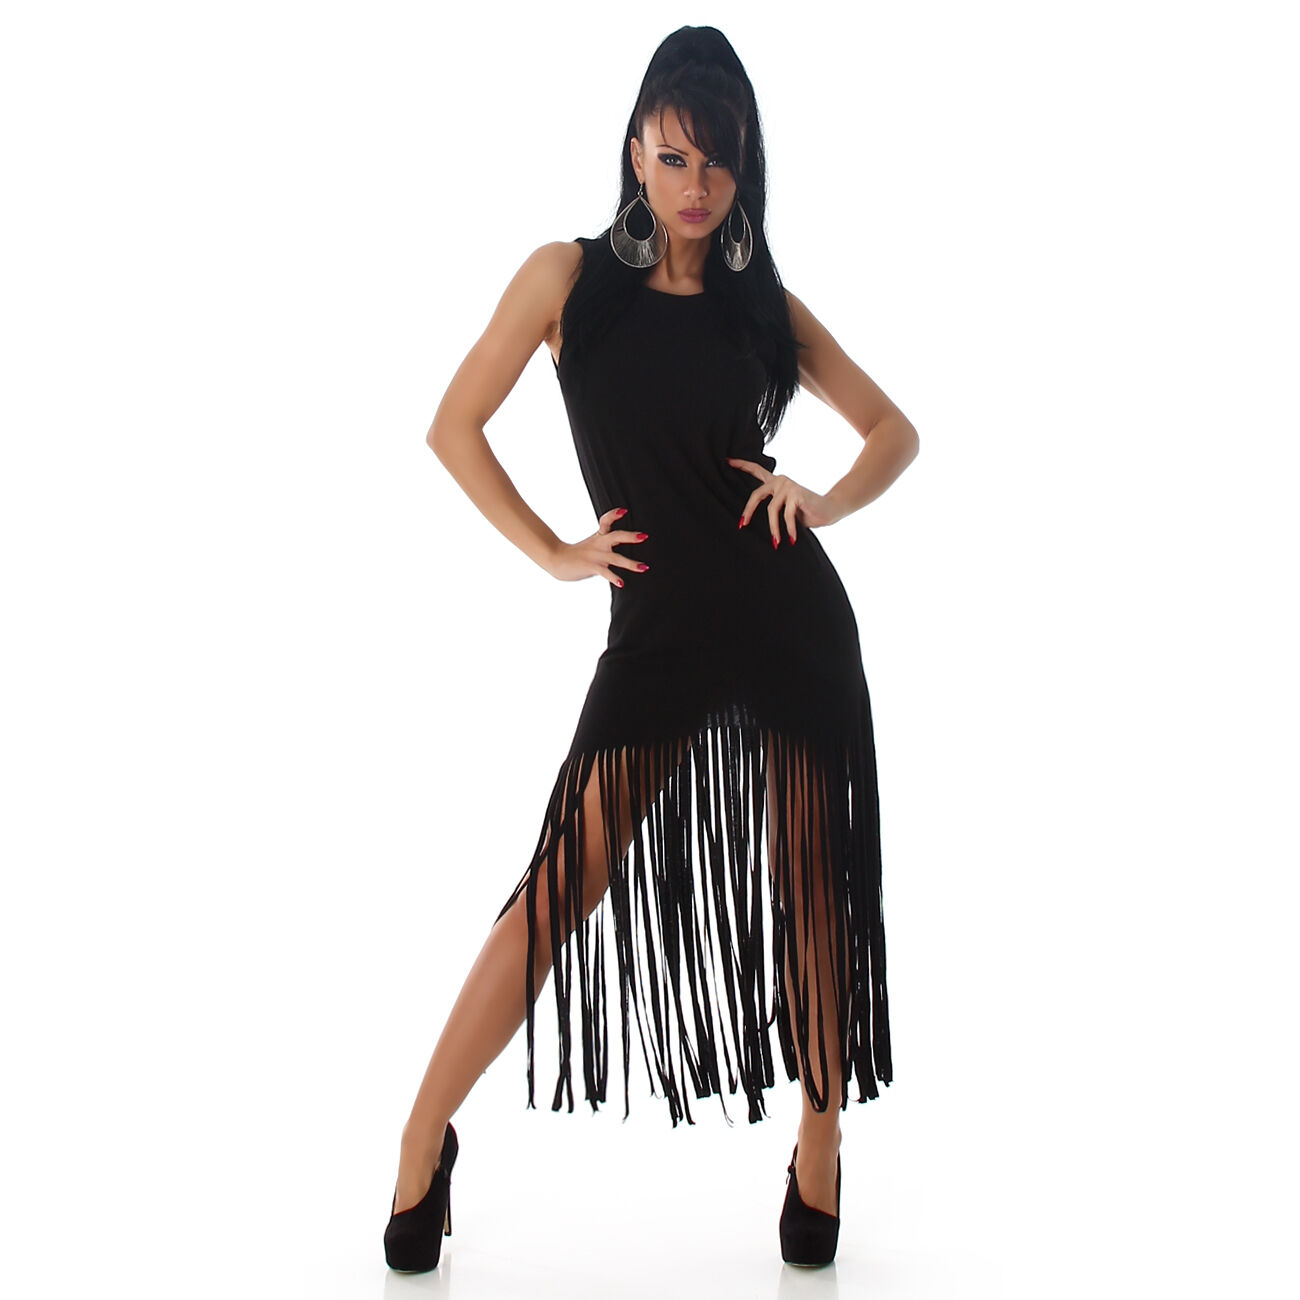 40399f05c0e786 Sexy Ärmelloses Minikleid Basic Kleid Strandkleid mit Fransen ...